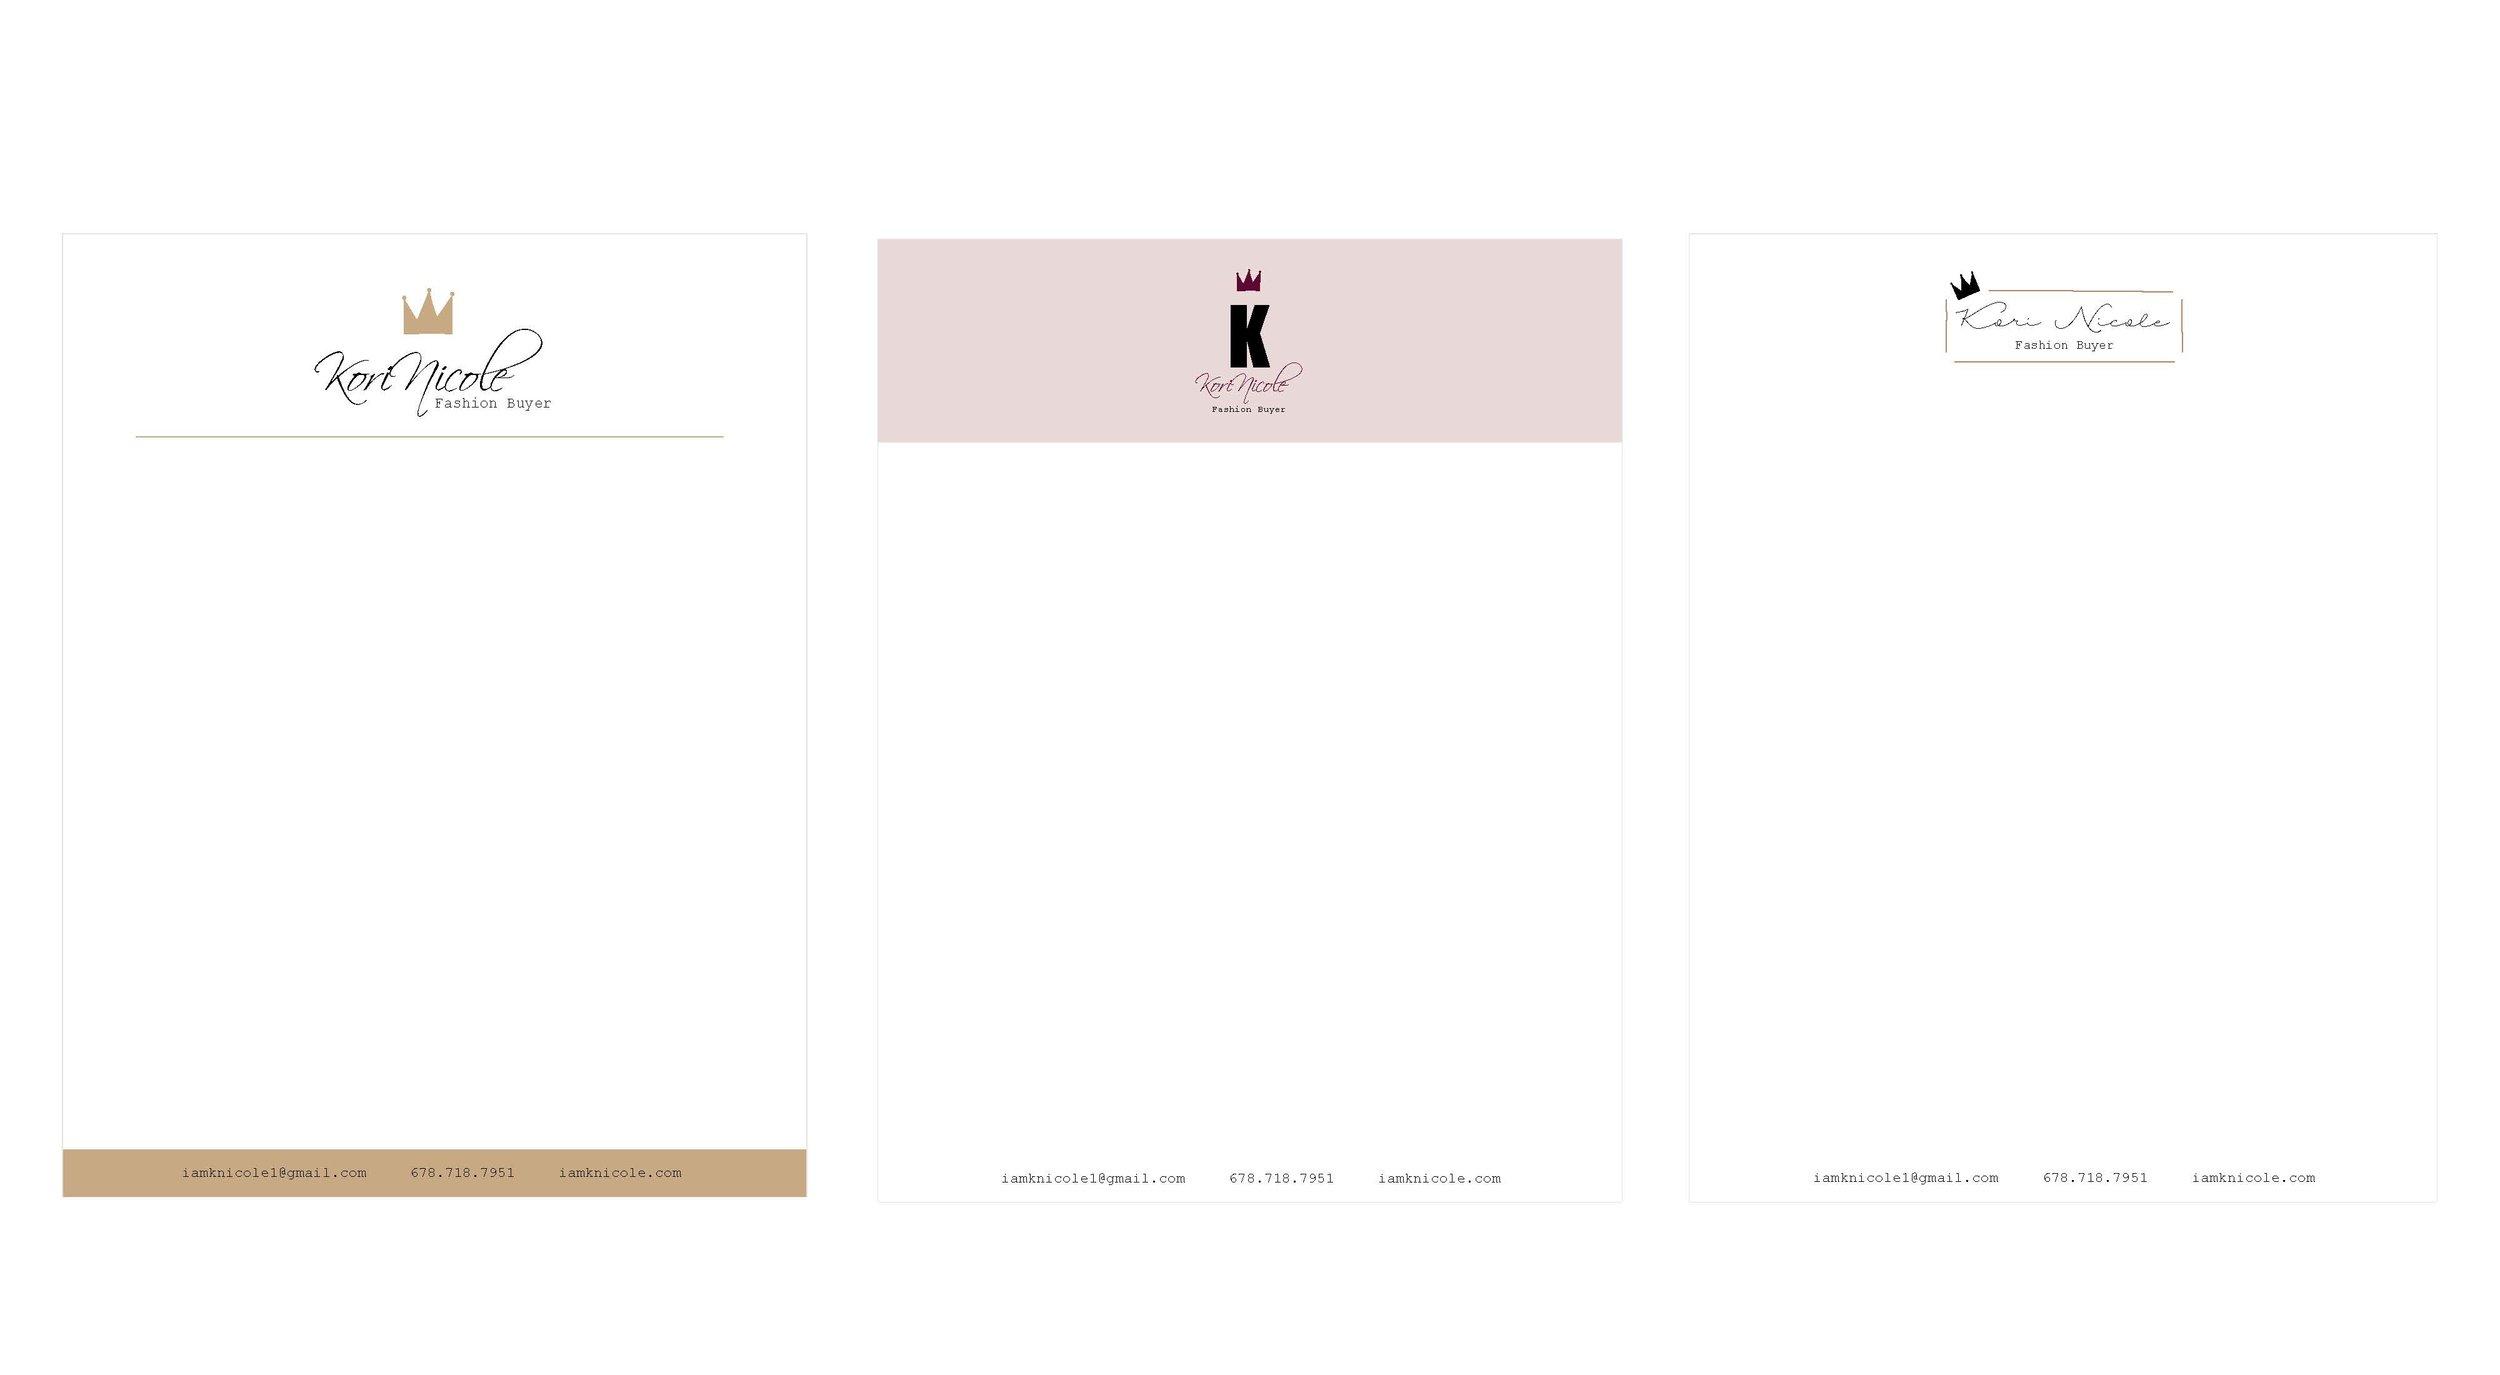 Branding_Page_39.jpg